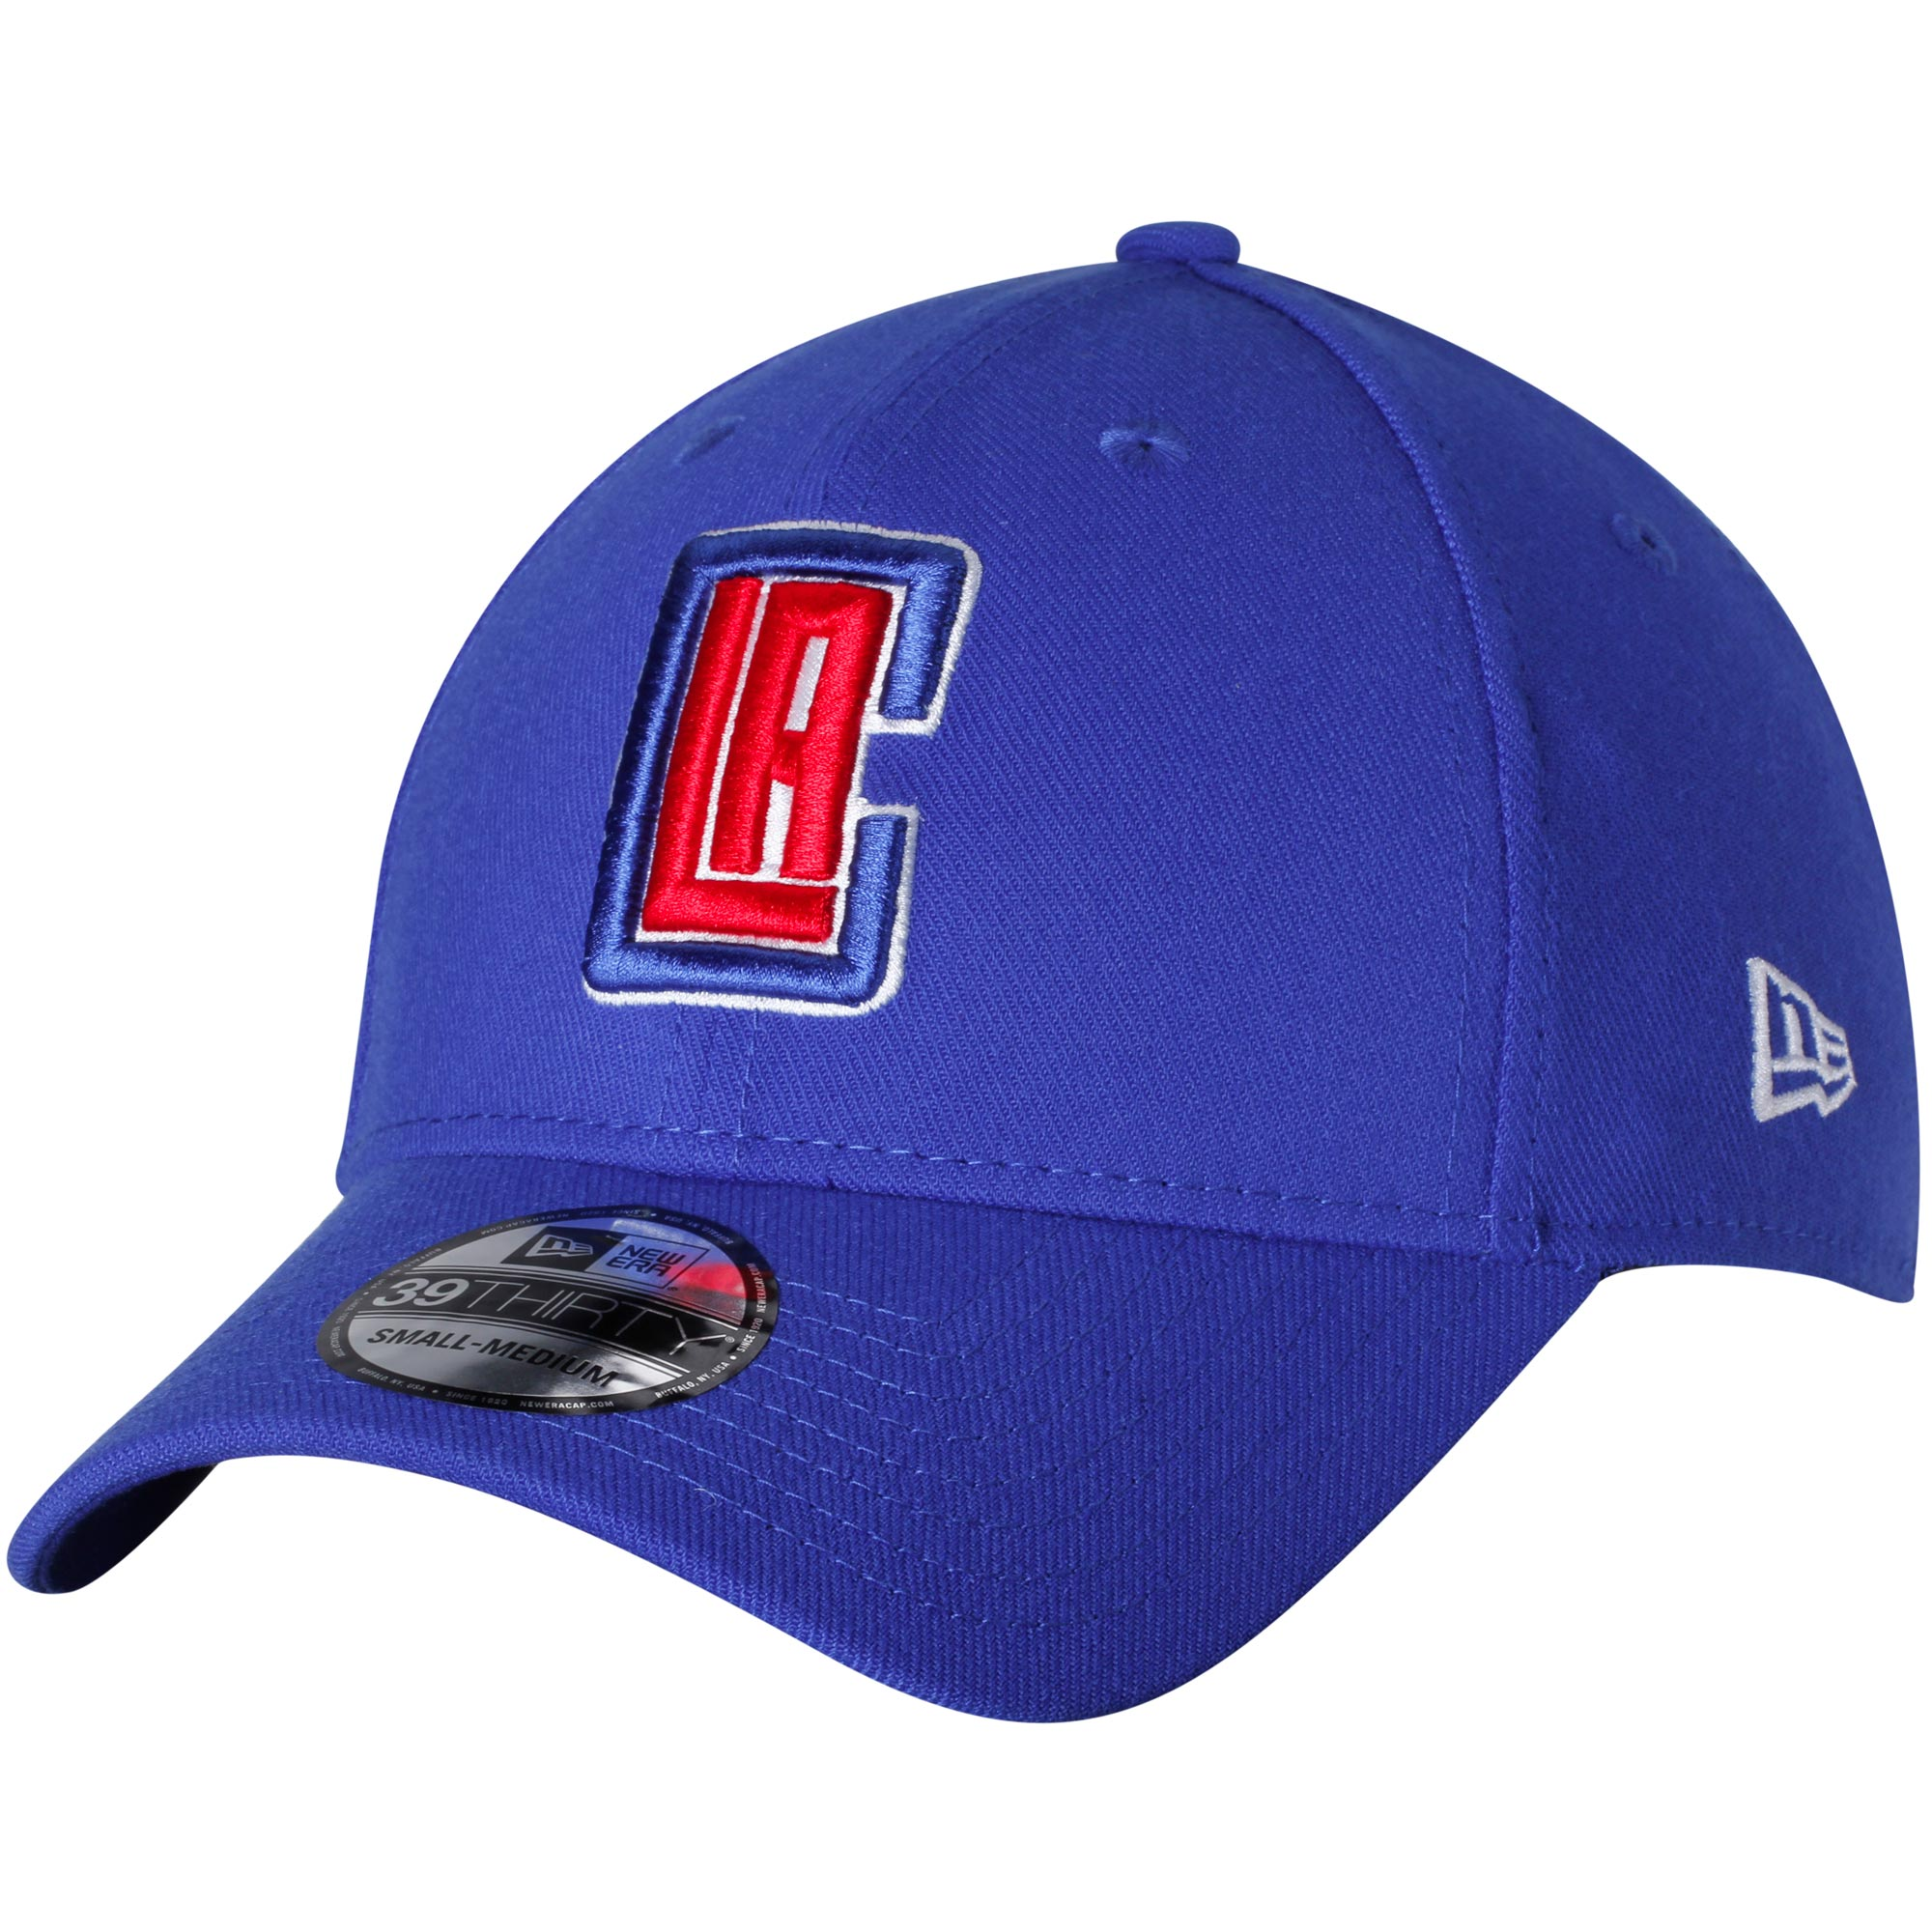 LA Clippers New Era Team Classic 39THIRTY Flex Hat - Royal